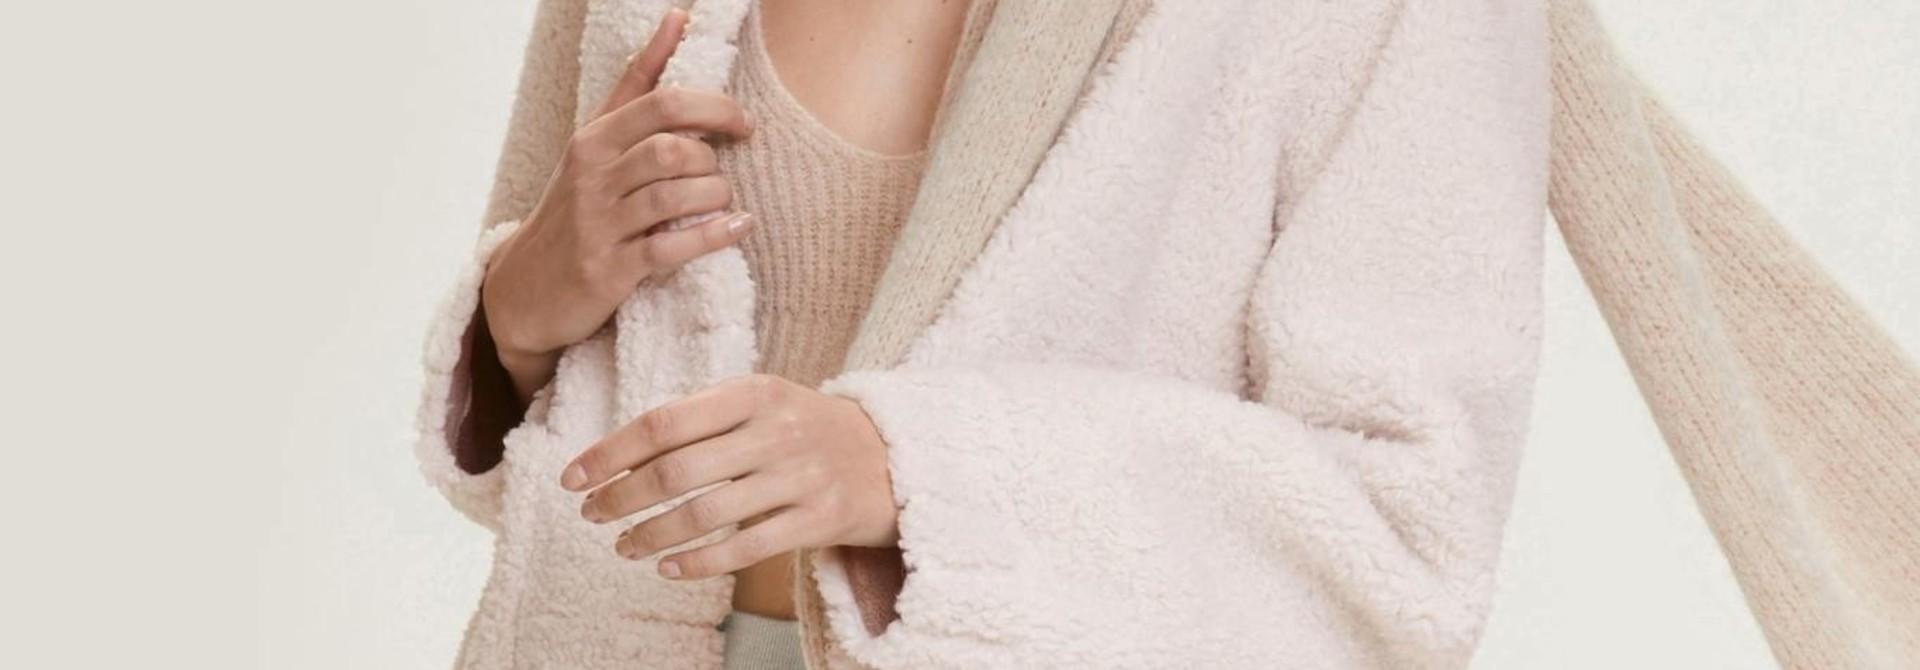 Twist On shearling jacket Dorothee Schumacher